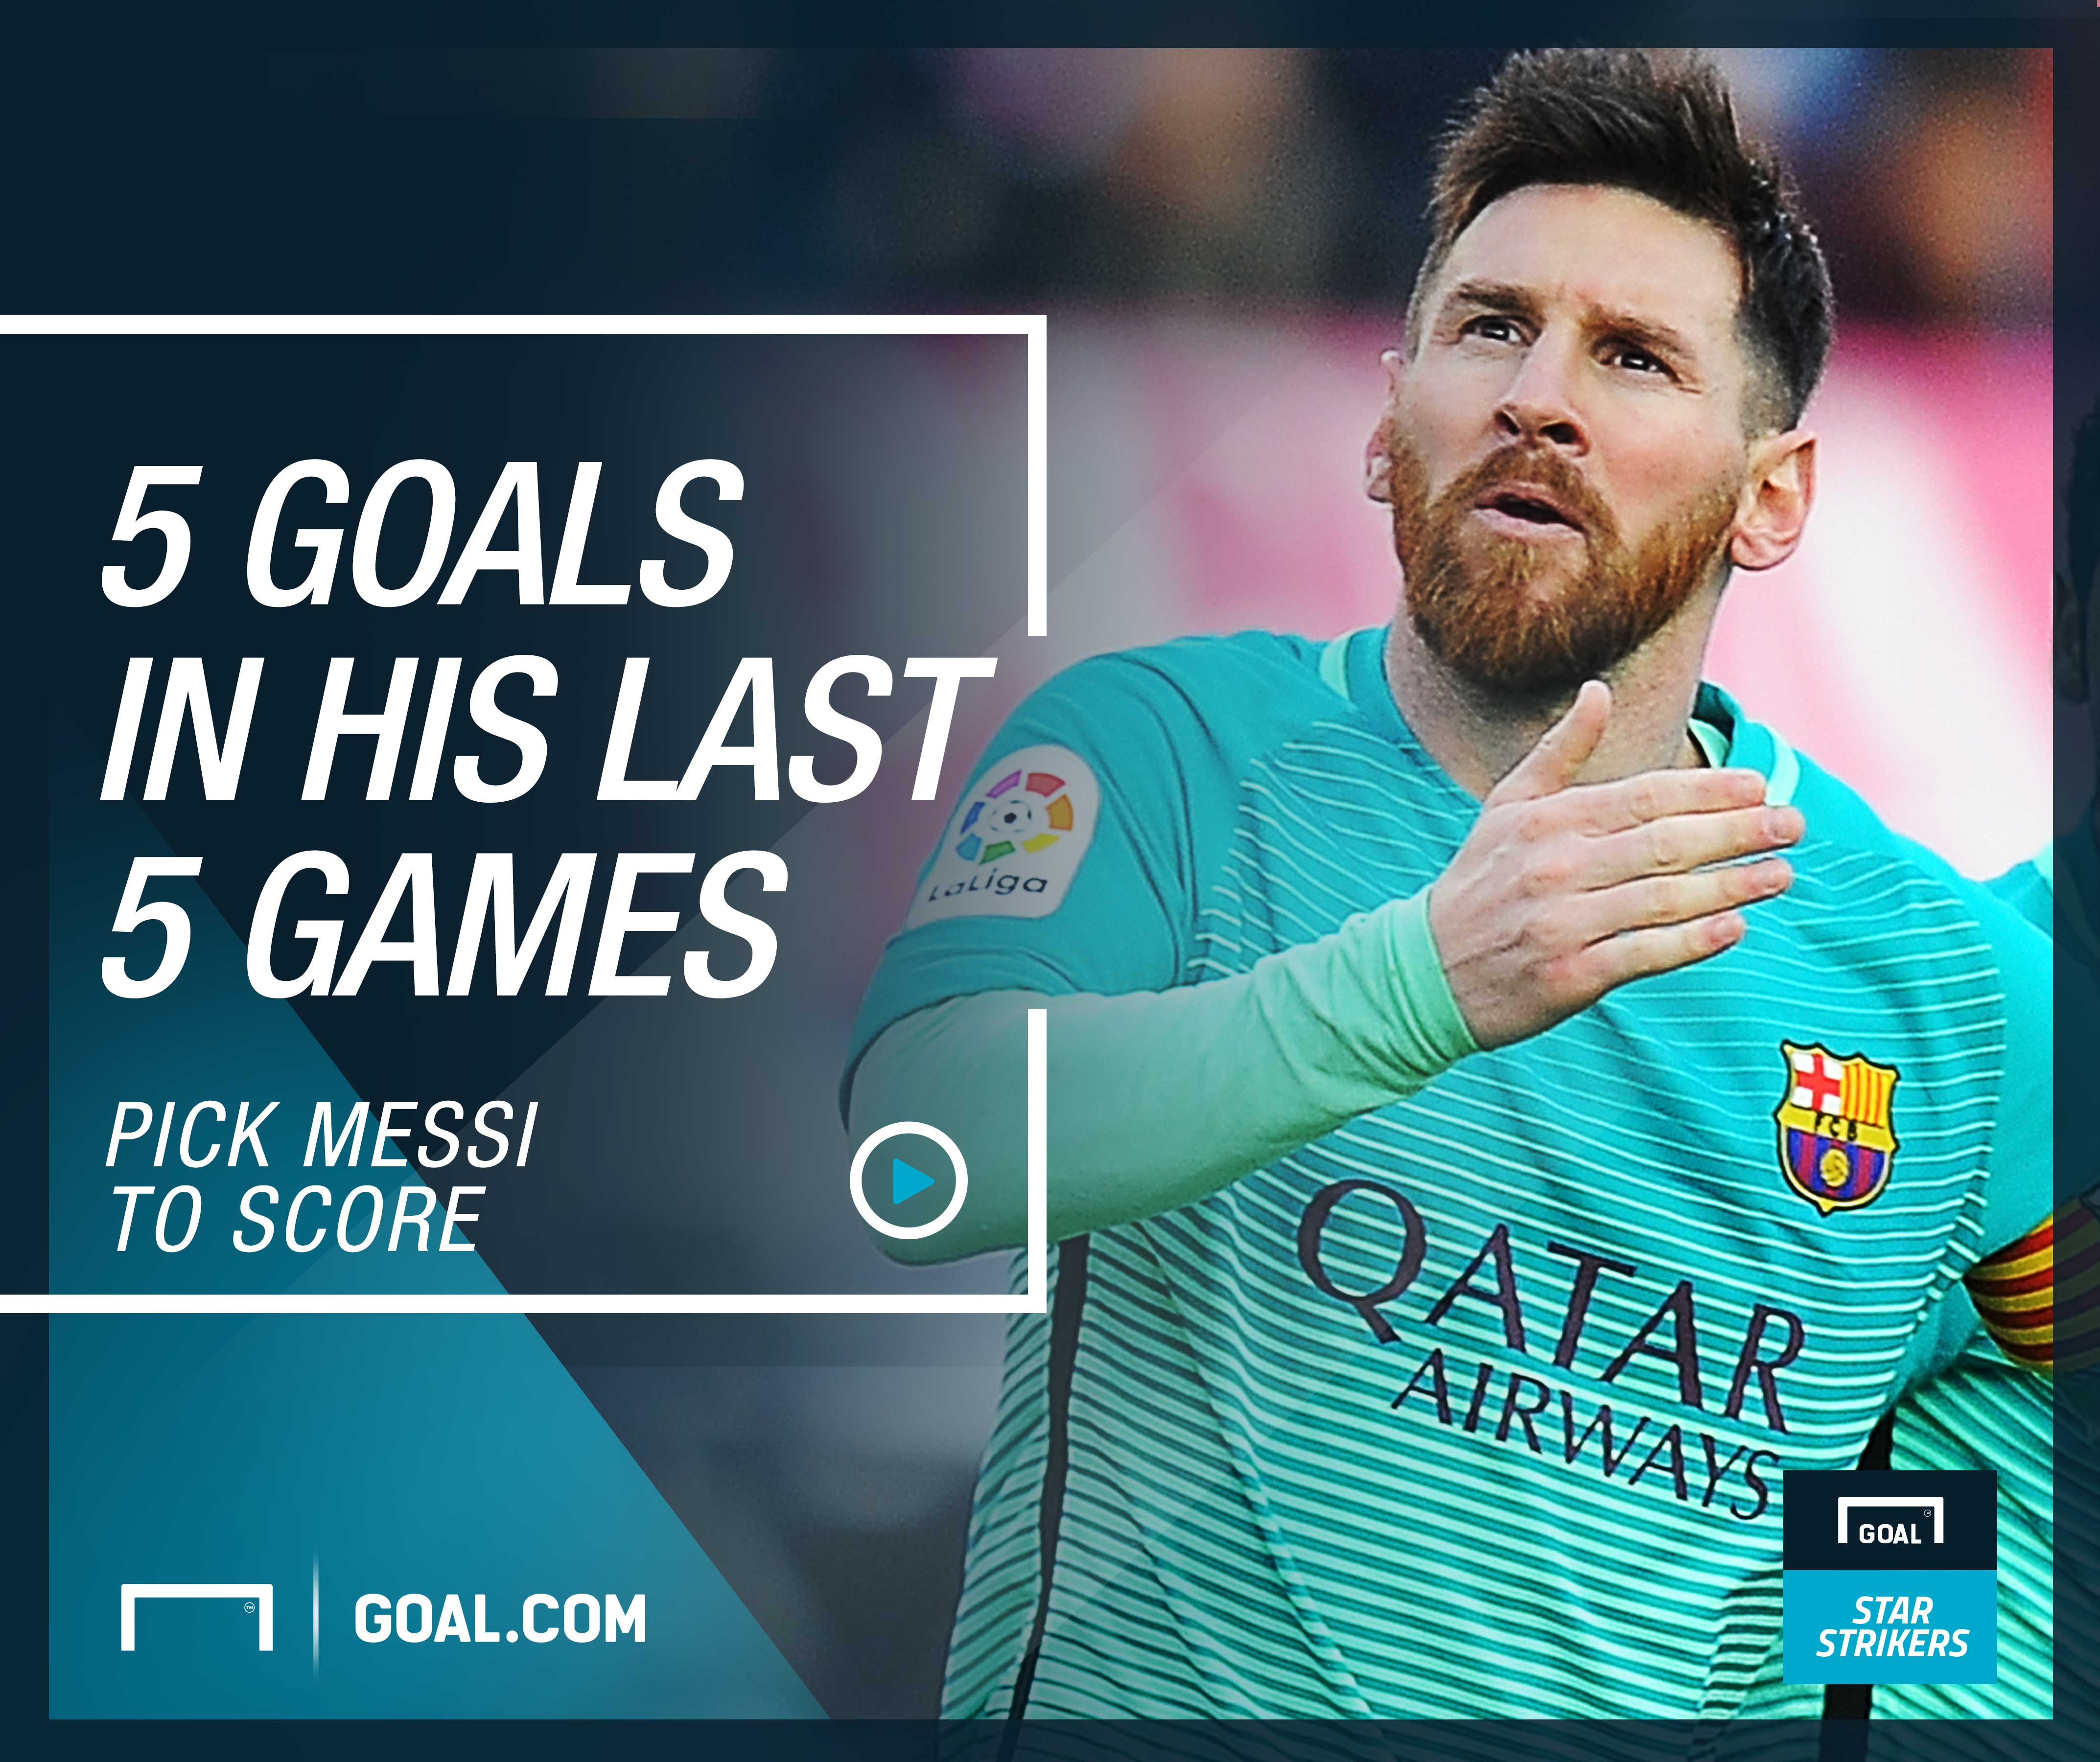 Messi, Goal Star Strikers